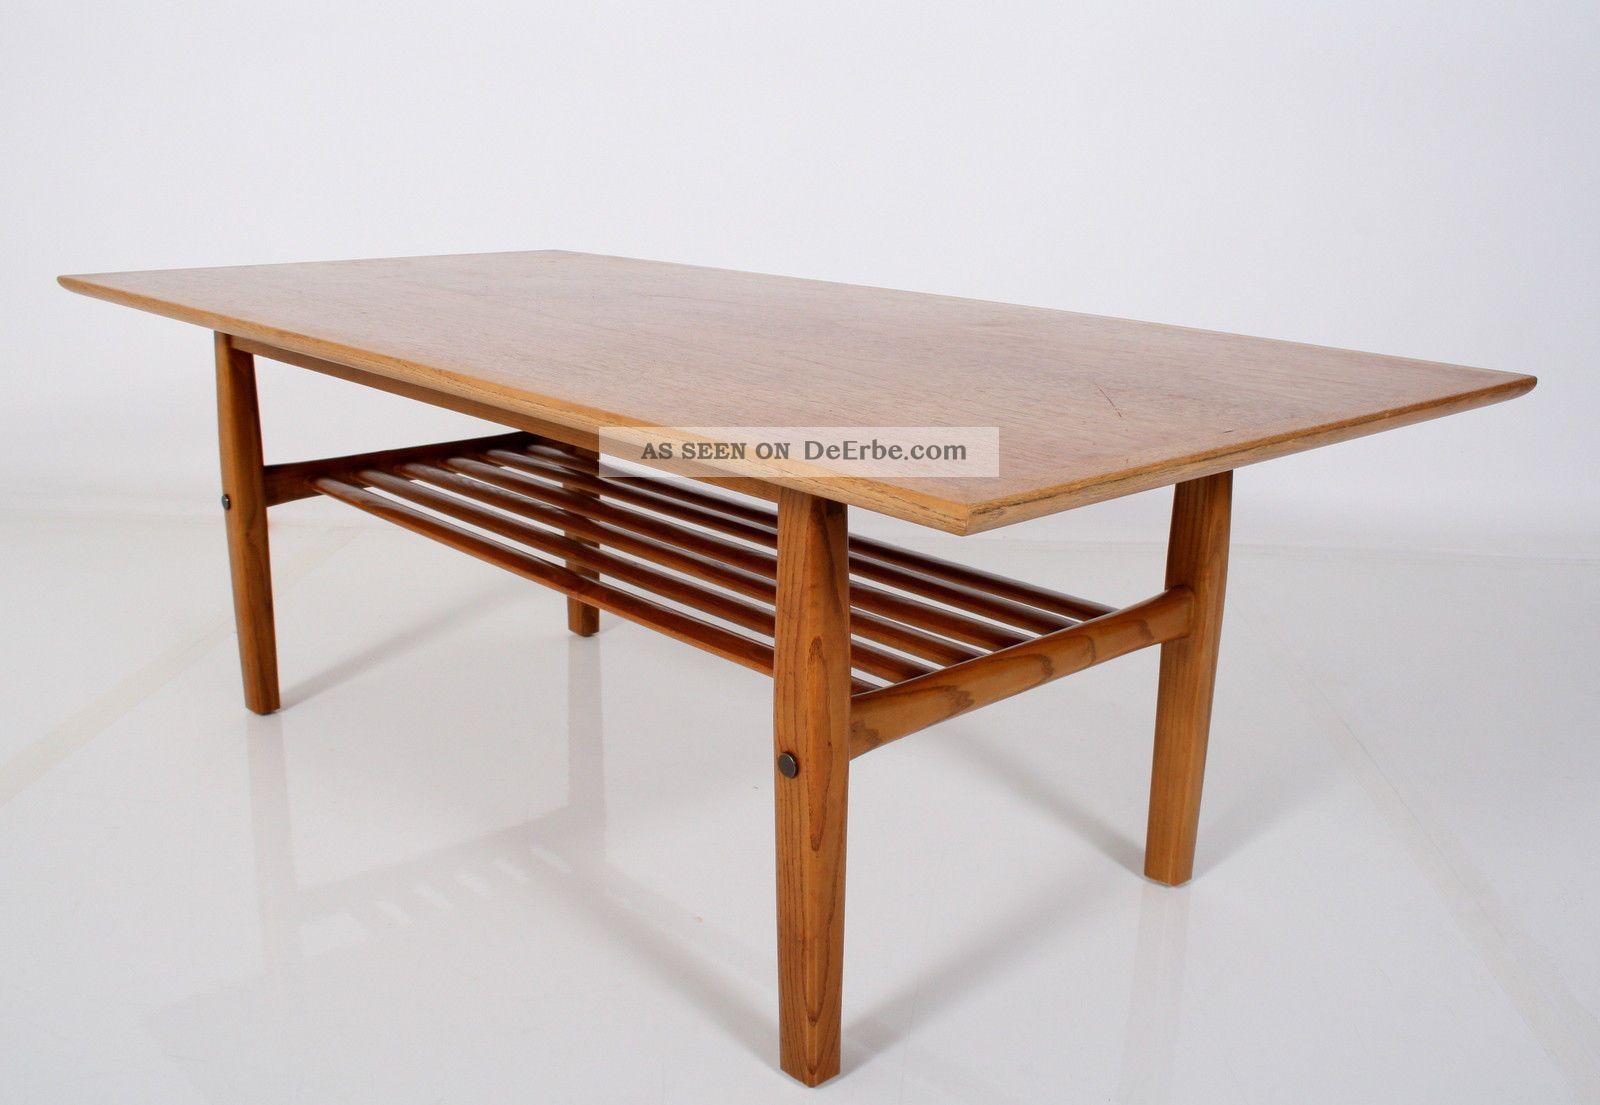 Teak 60er Coffee Table Danish Design Couchtisch Tisch Table 60s A ...